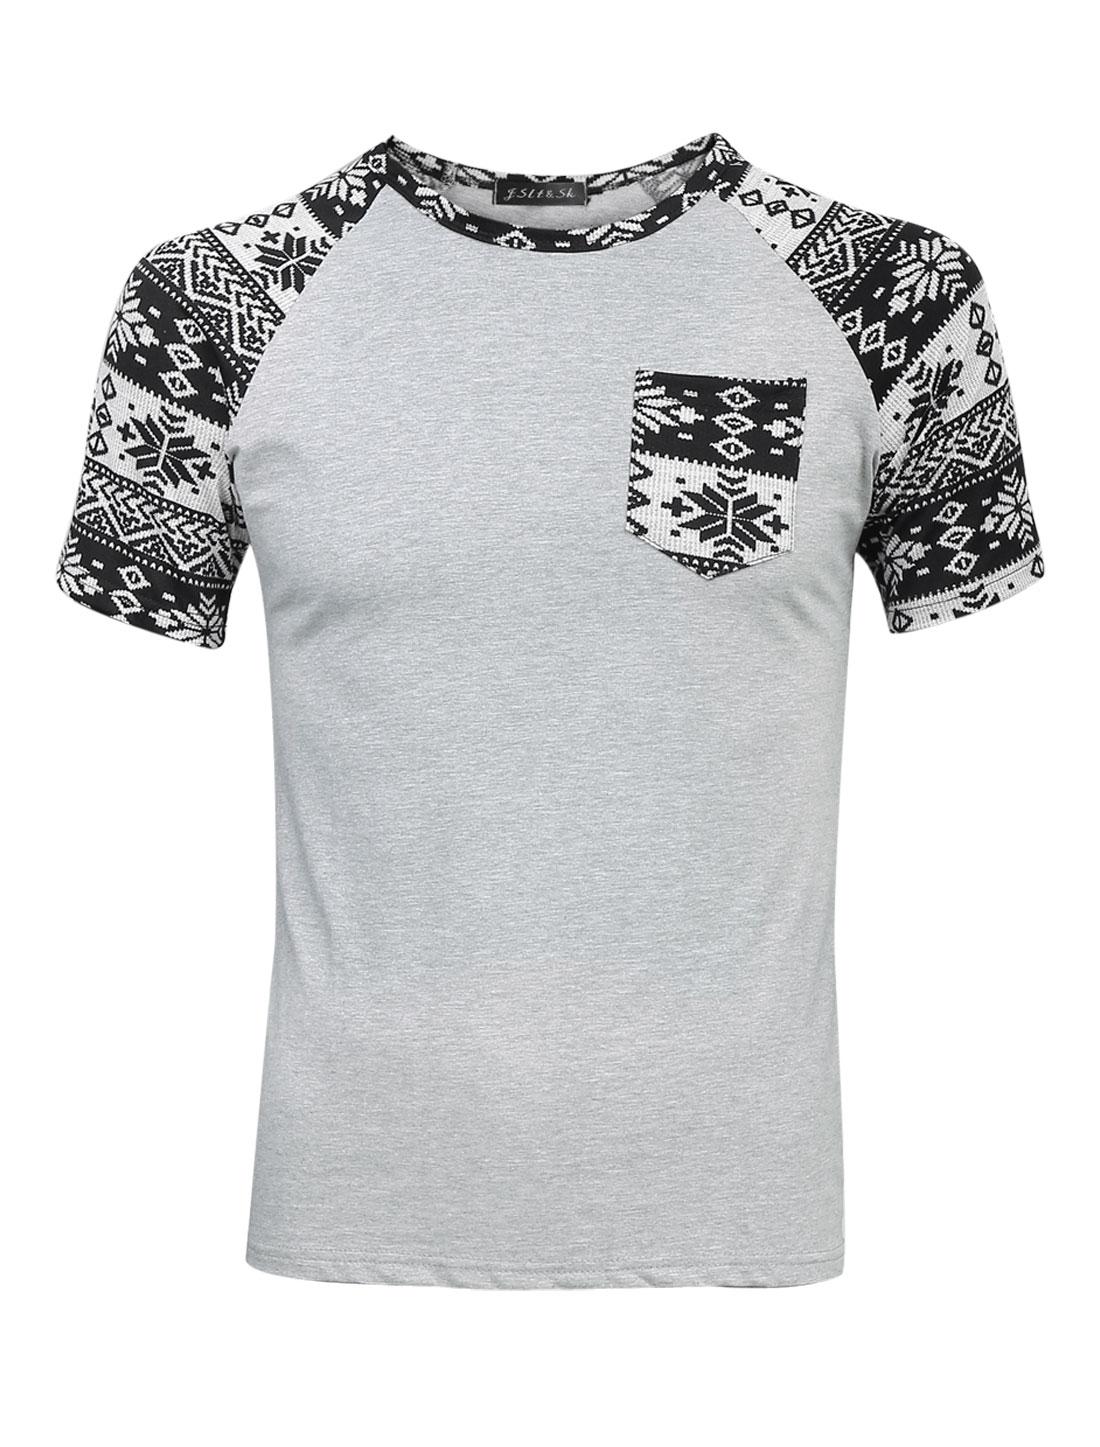 Men Snowflake Prints Breast Pocket Patchwork Slim Fit Tee Light Gray S